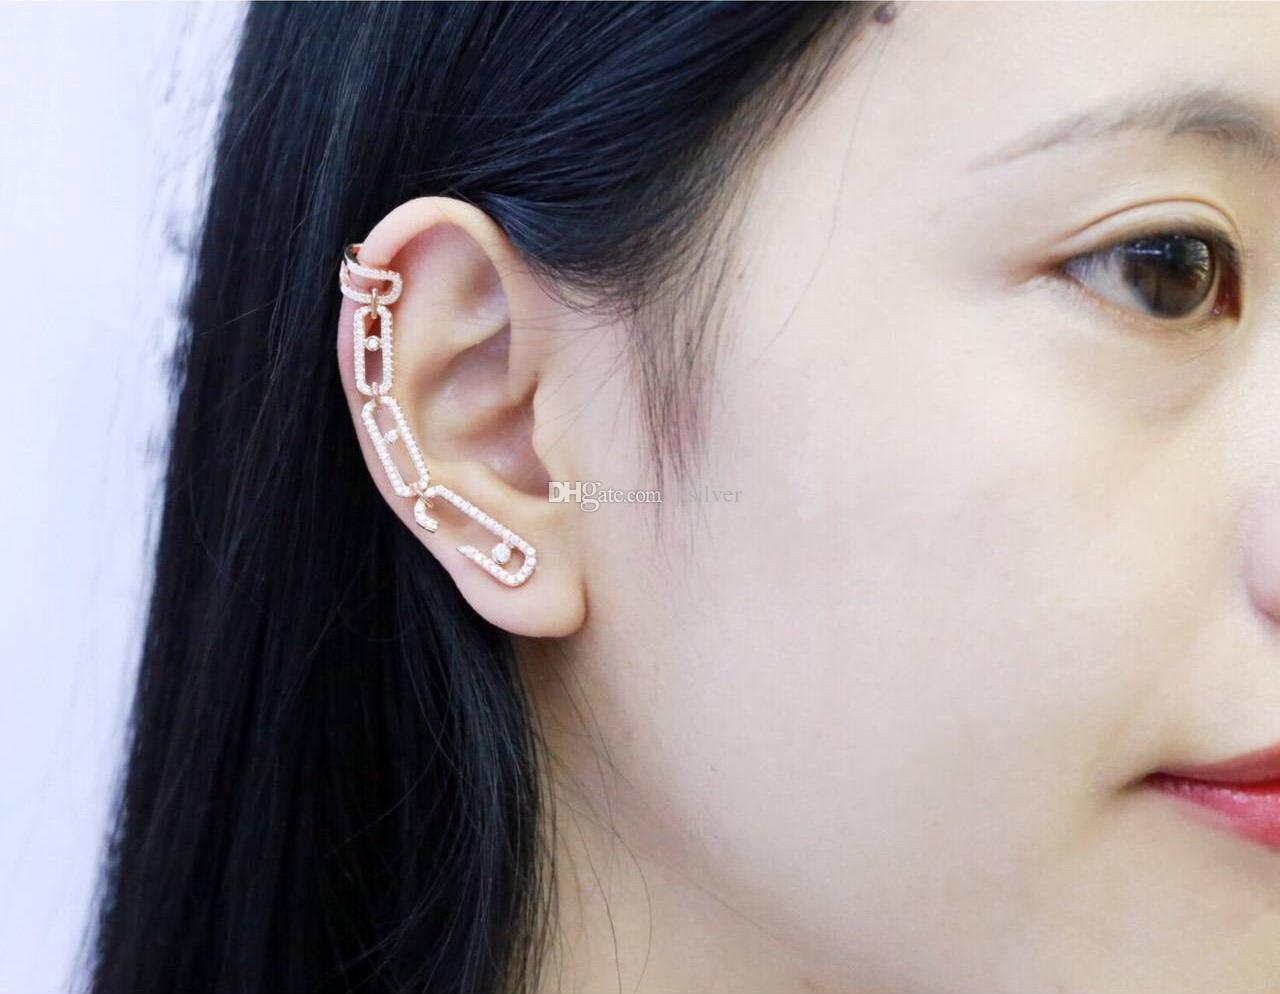 Mulheres Jóias de Prata Esterlina 925 boucle d'oreille femme 2017 Geométrica Em Movimento pedra Cuff Ear Brincos 3A Zircônia Unicórnio Pin Assimétrico